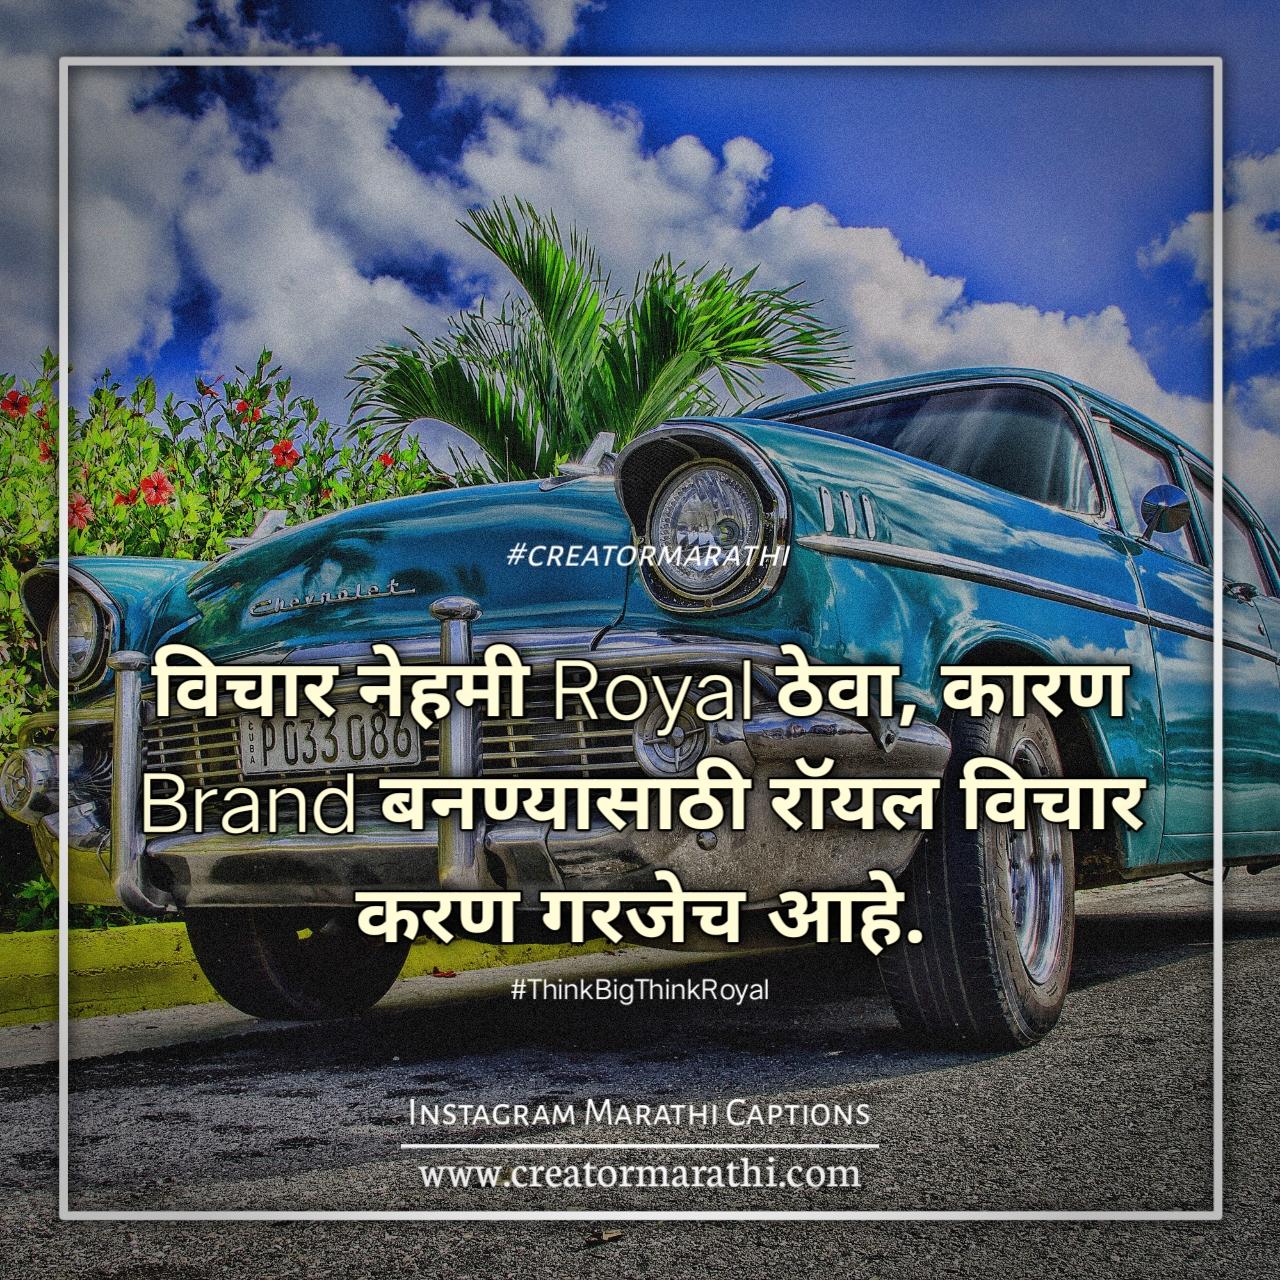 Instagram Marathi Captions